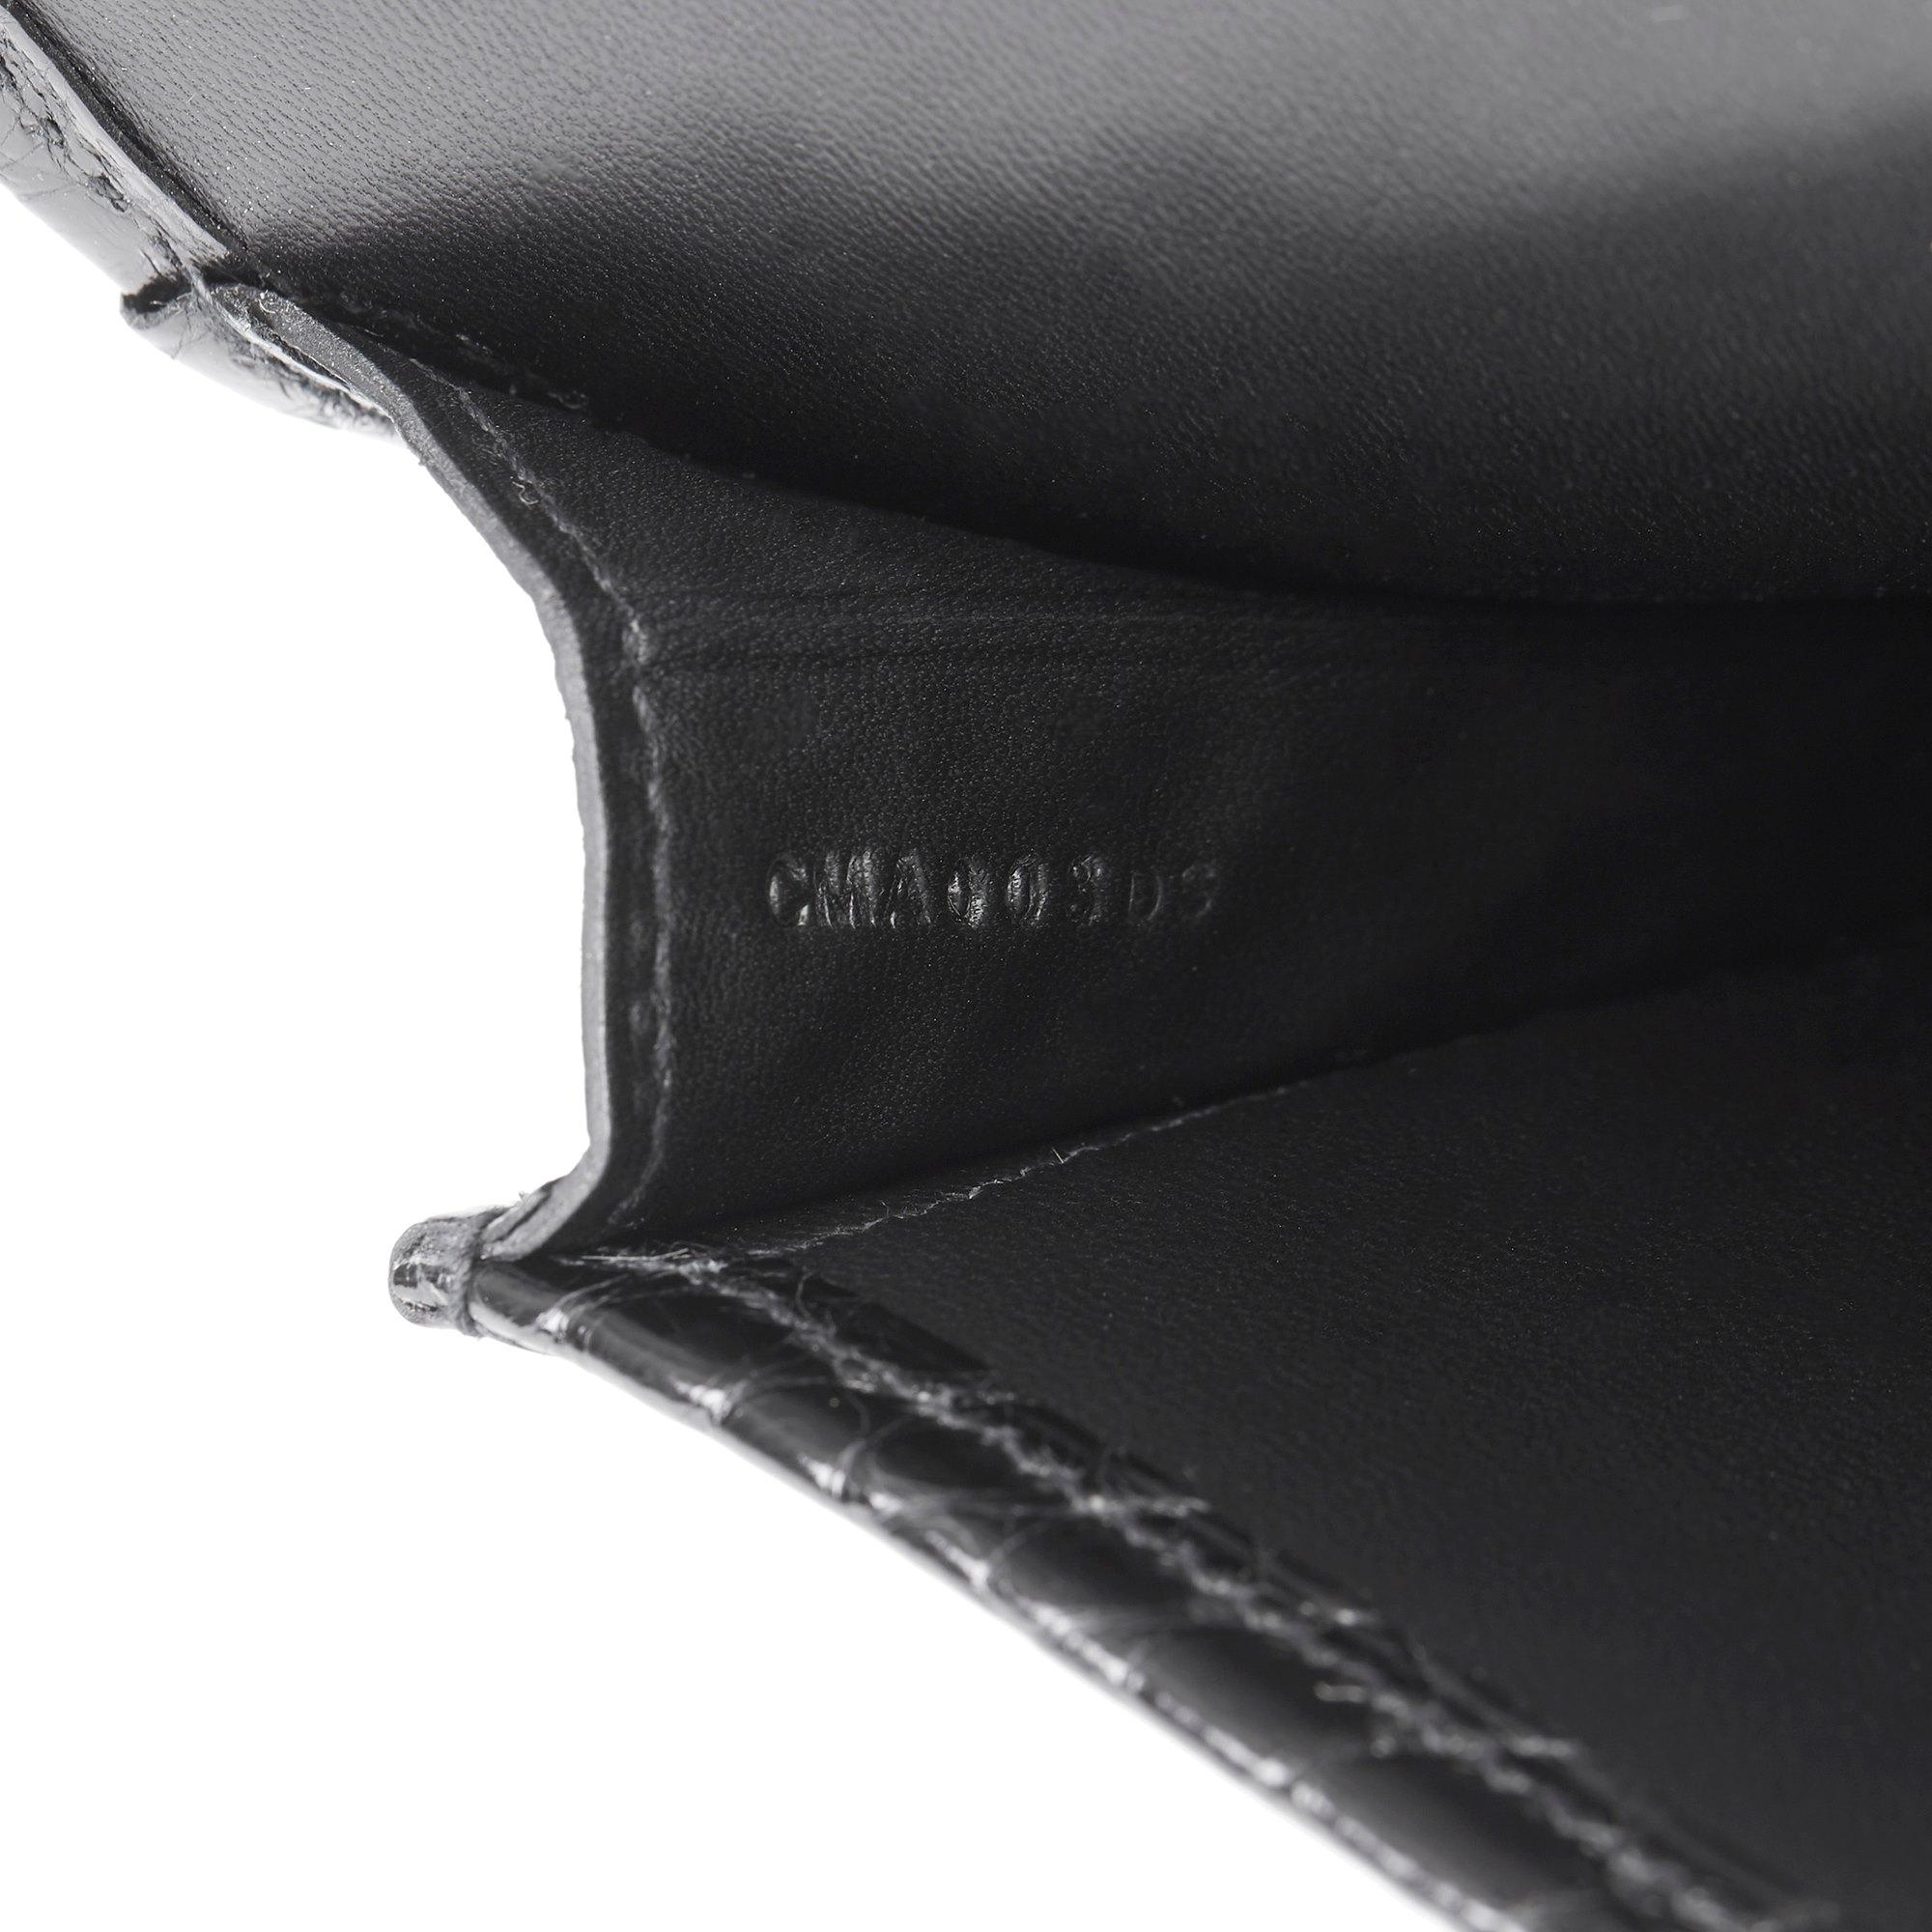 Hermès Black Shiny Mississippiensis Alligator Leather Jige 29